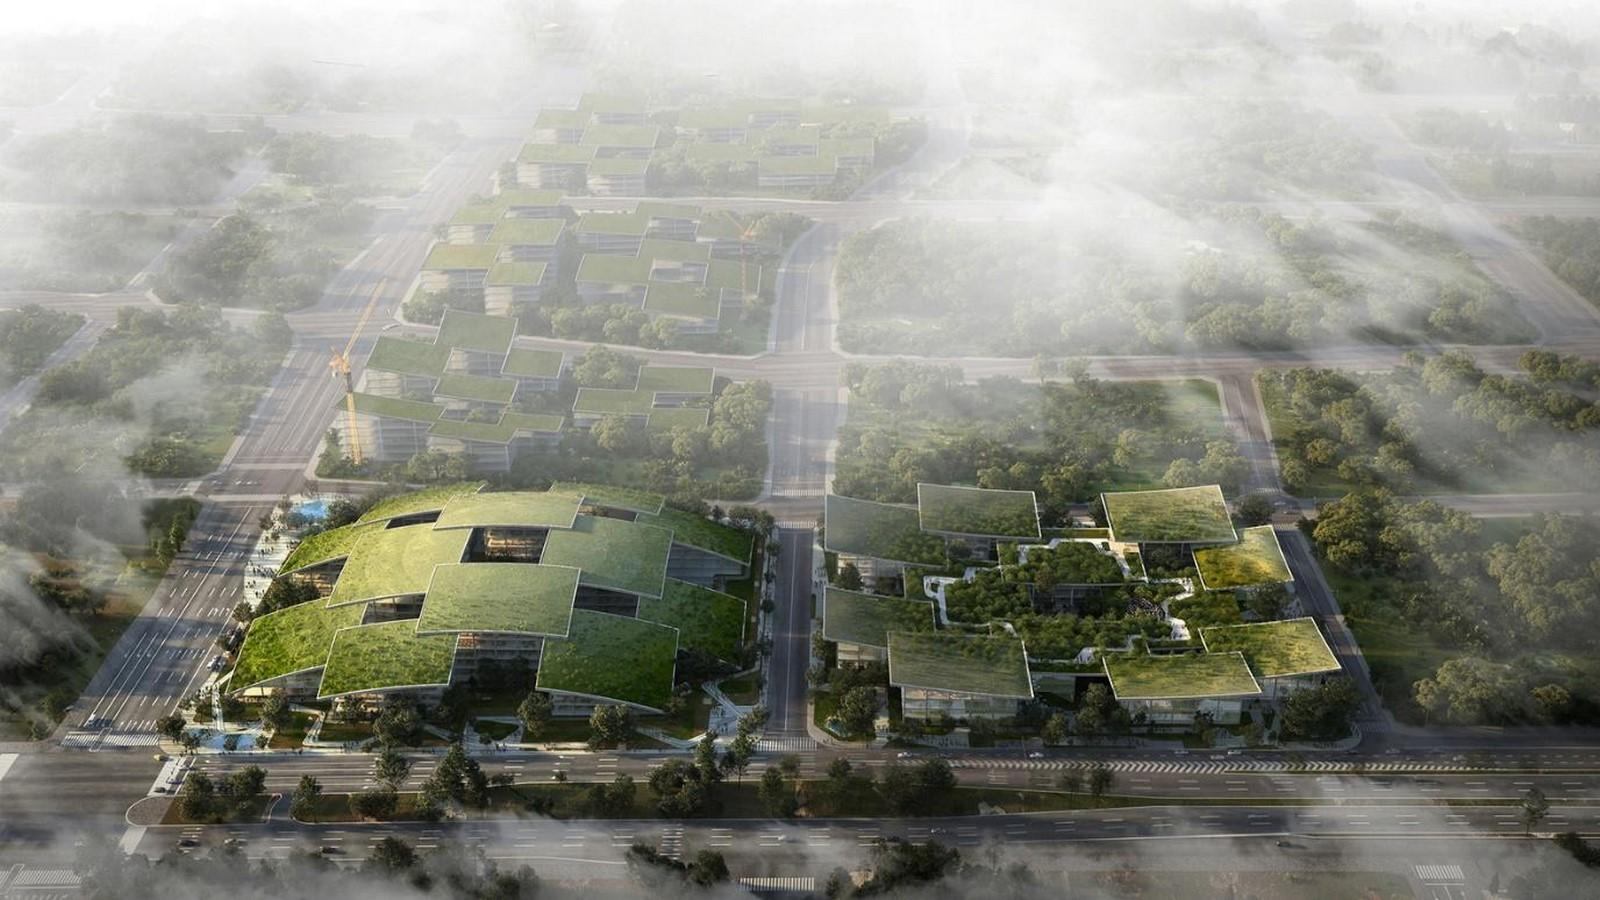 An Artificial Intelligence-Based 'Smart City' in China plans revealed Bjarke Ingels - Sheet1